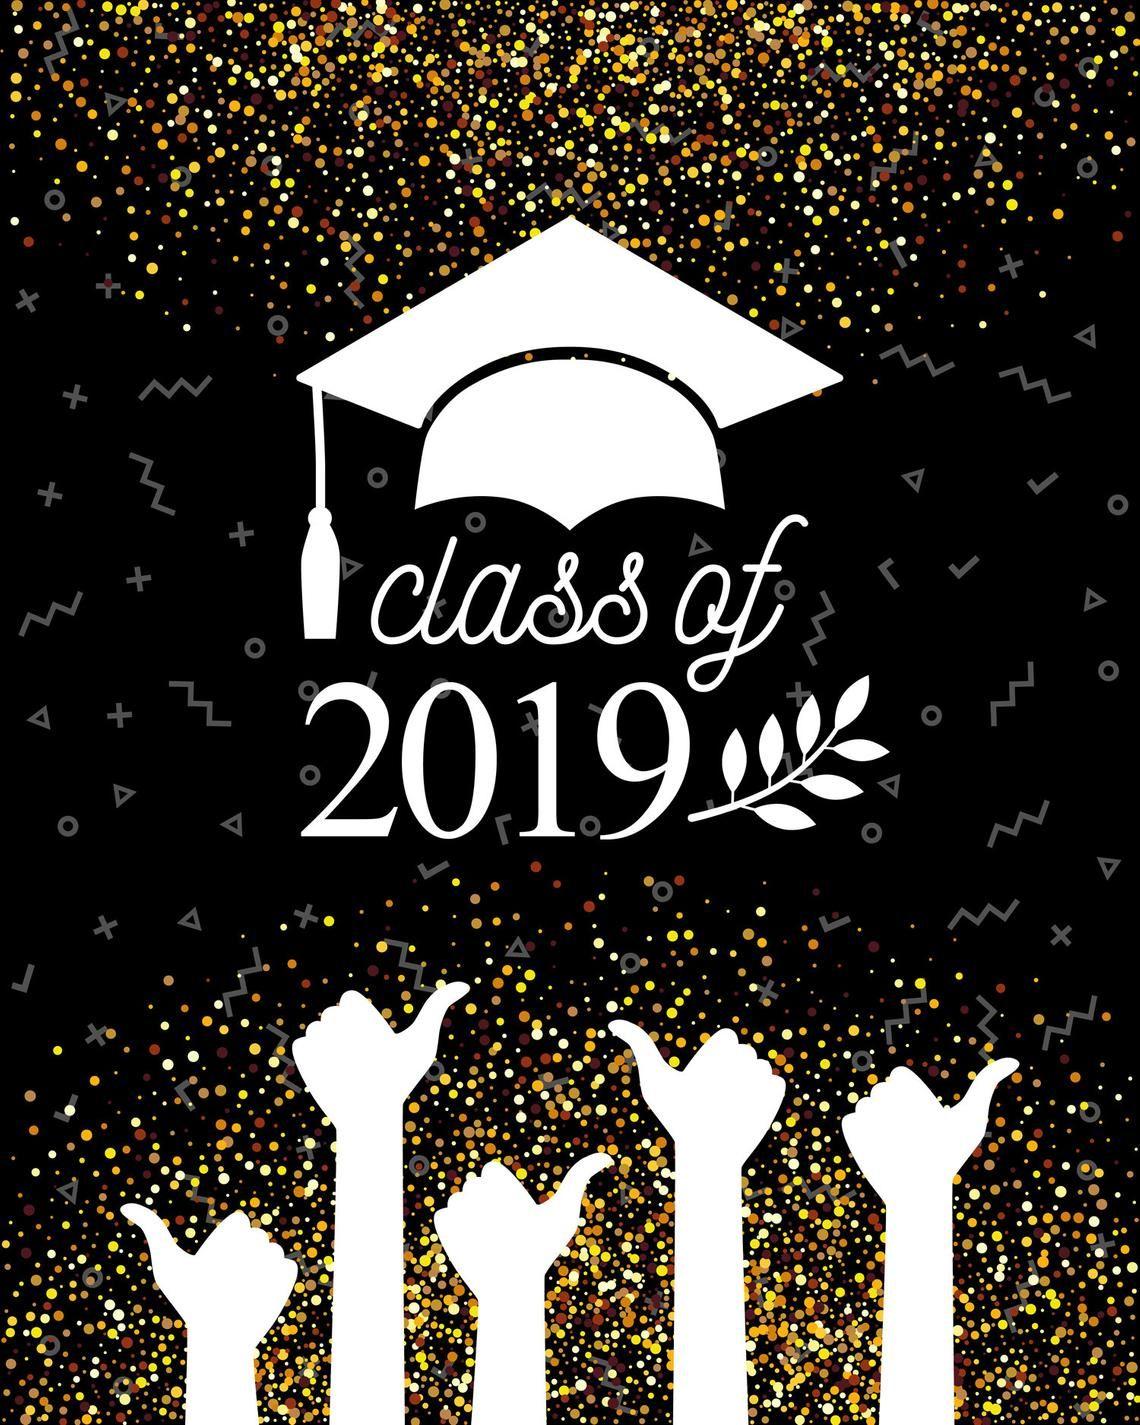 Graduation Class Of 2019 Banner Golden Black Photography Backdrops